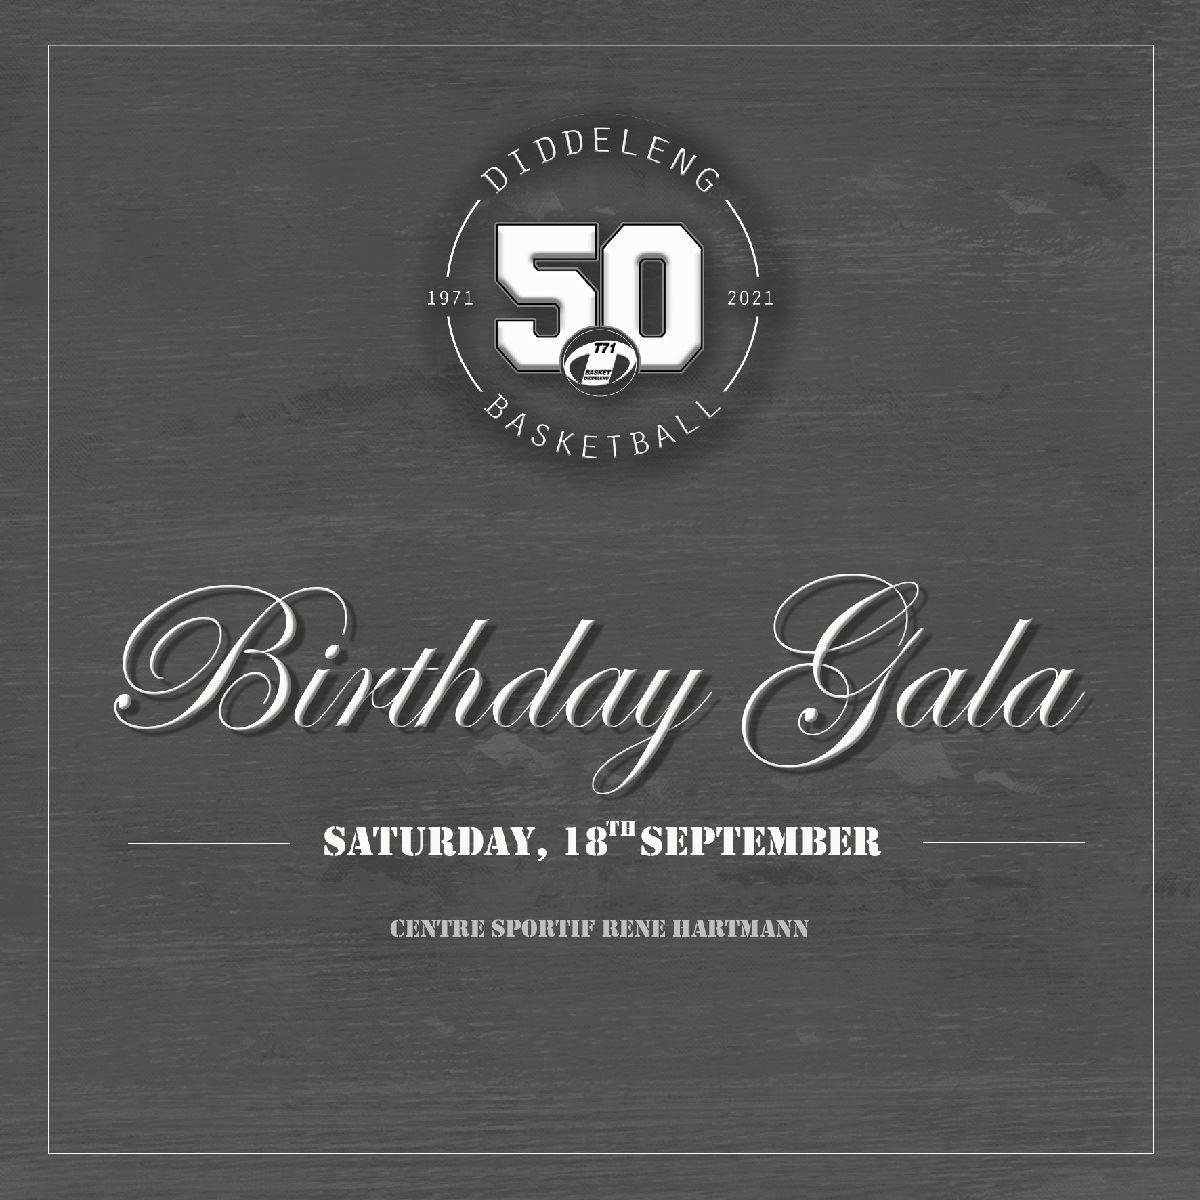 Programm zum 50. Gebuertsdag